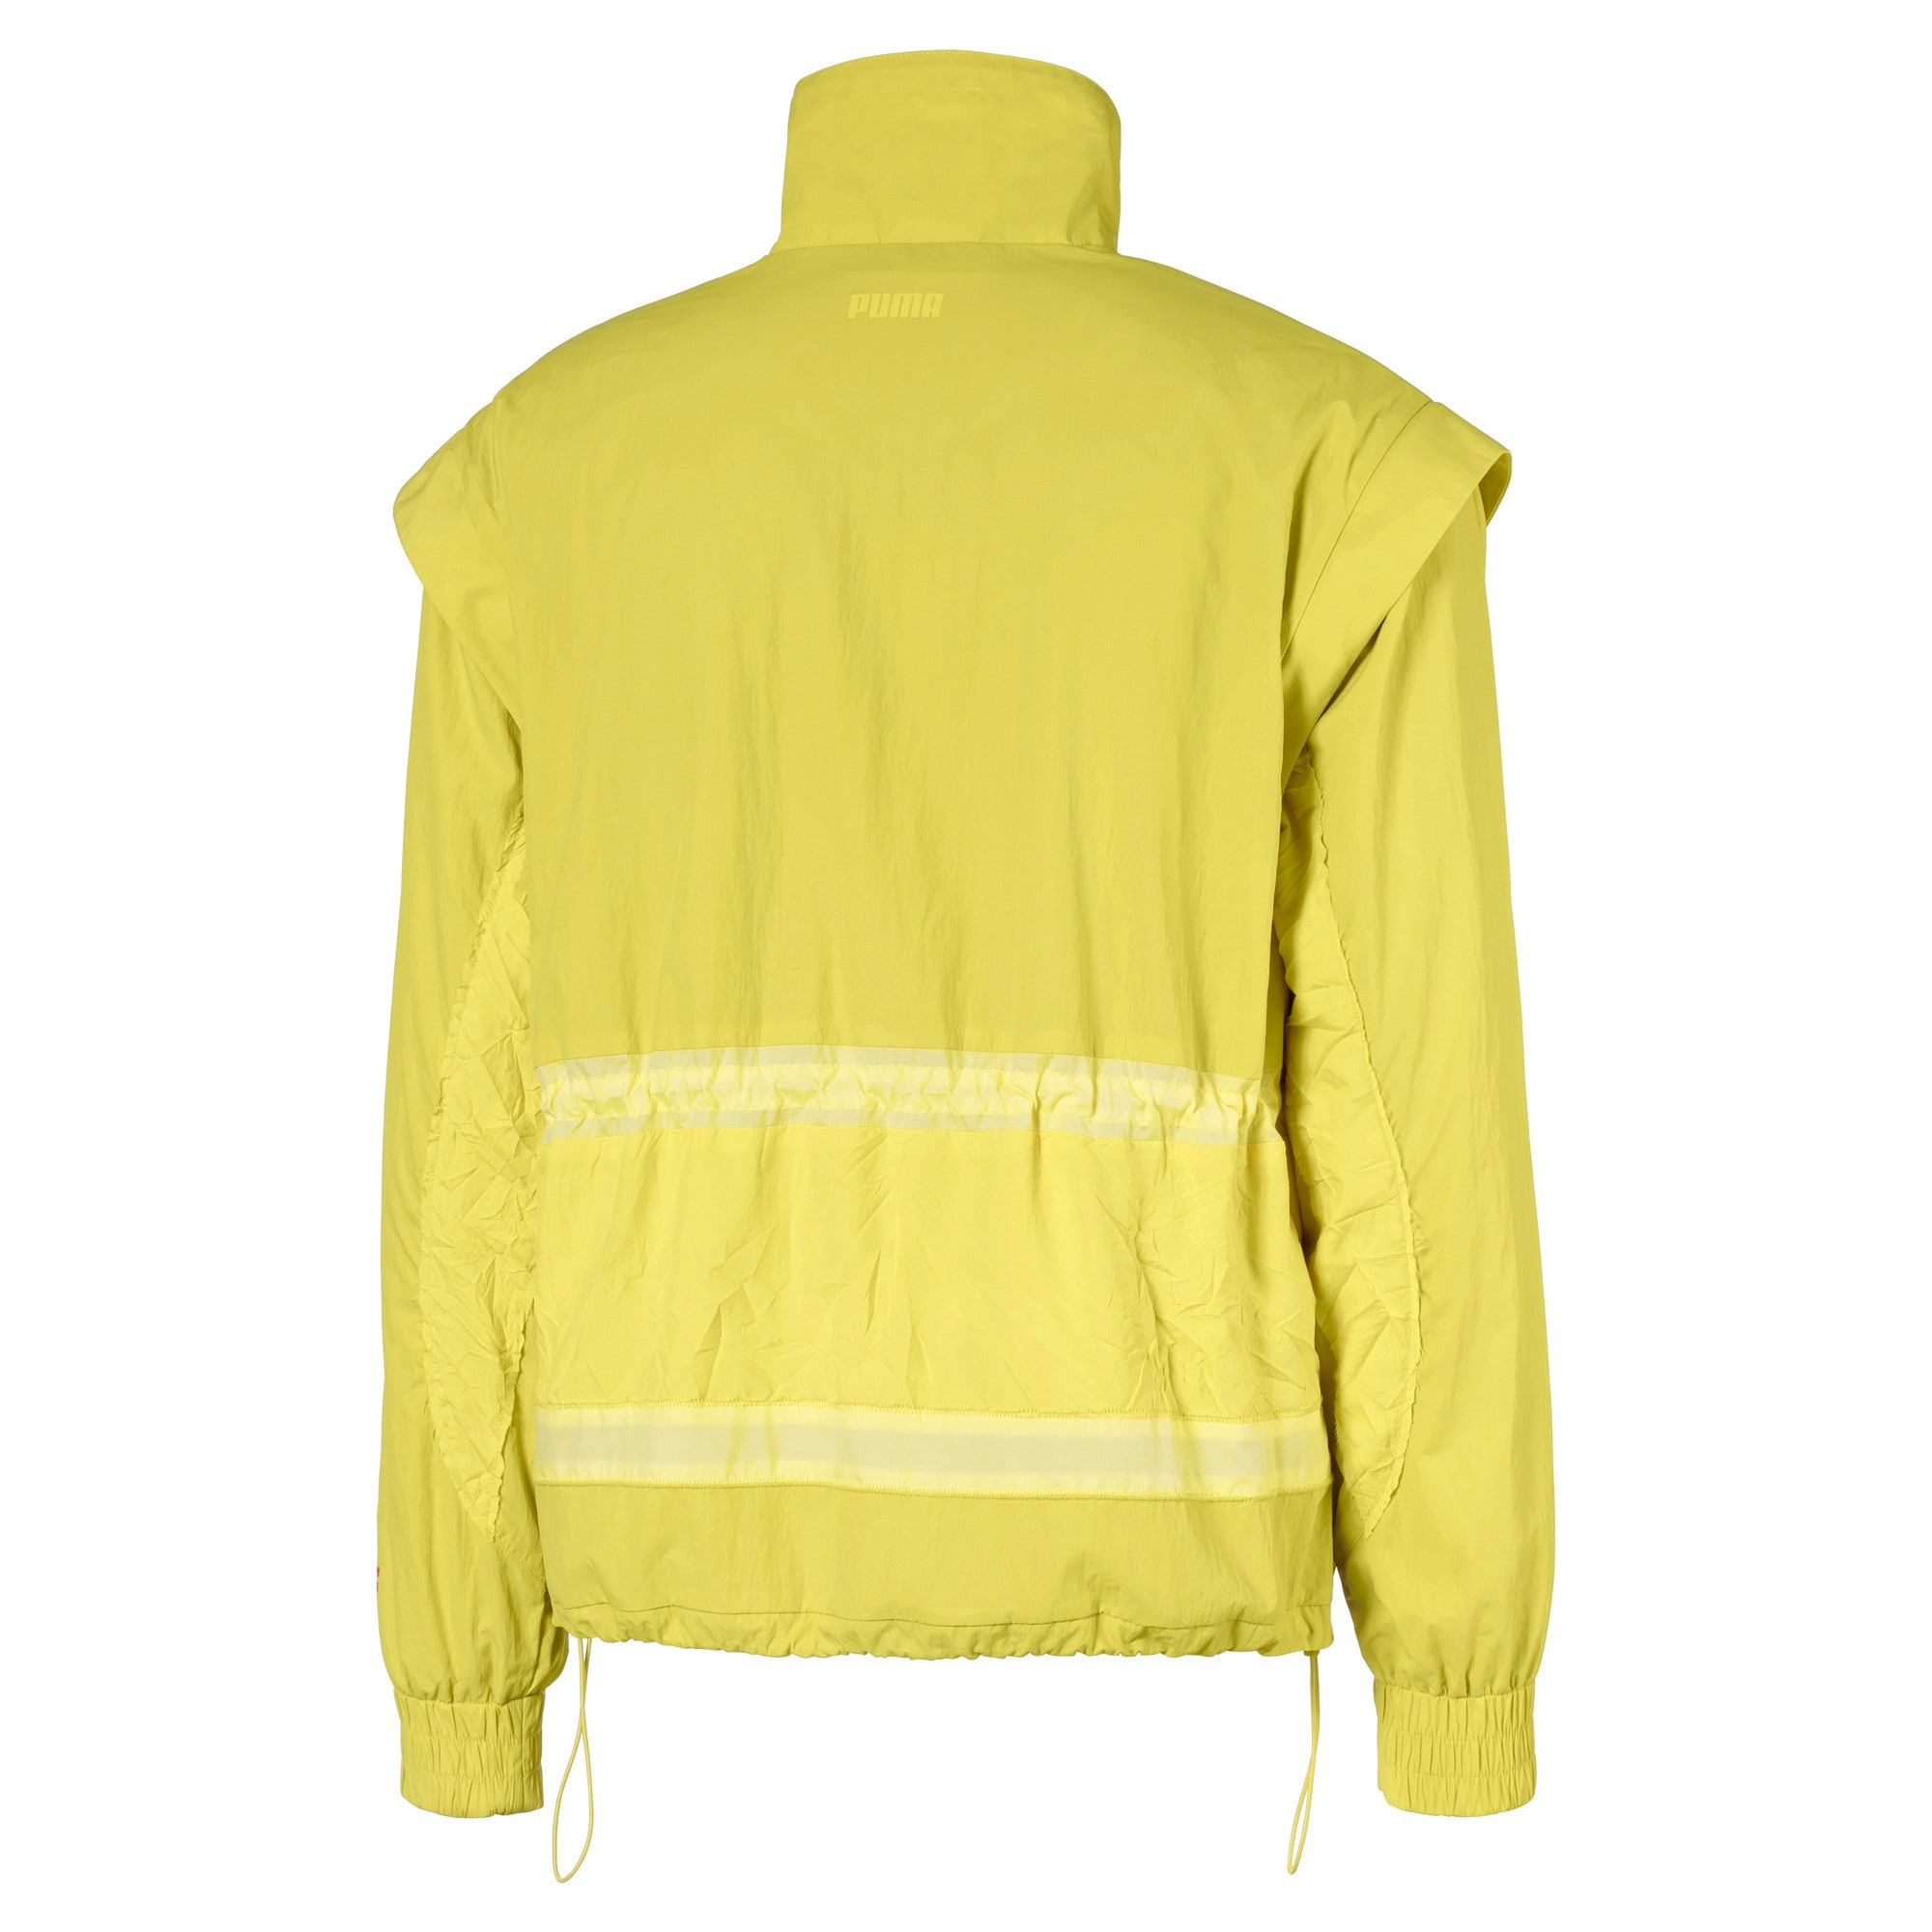 Thumbnail 6 of Alteration Men's Jacket, Celery, medium